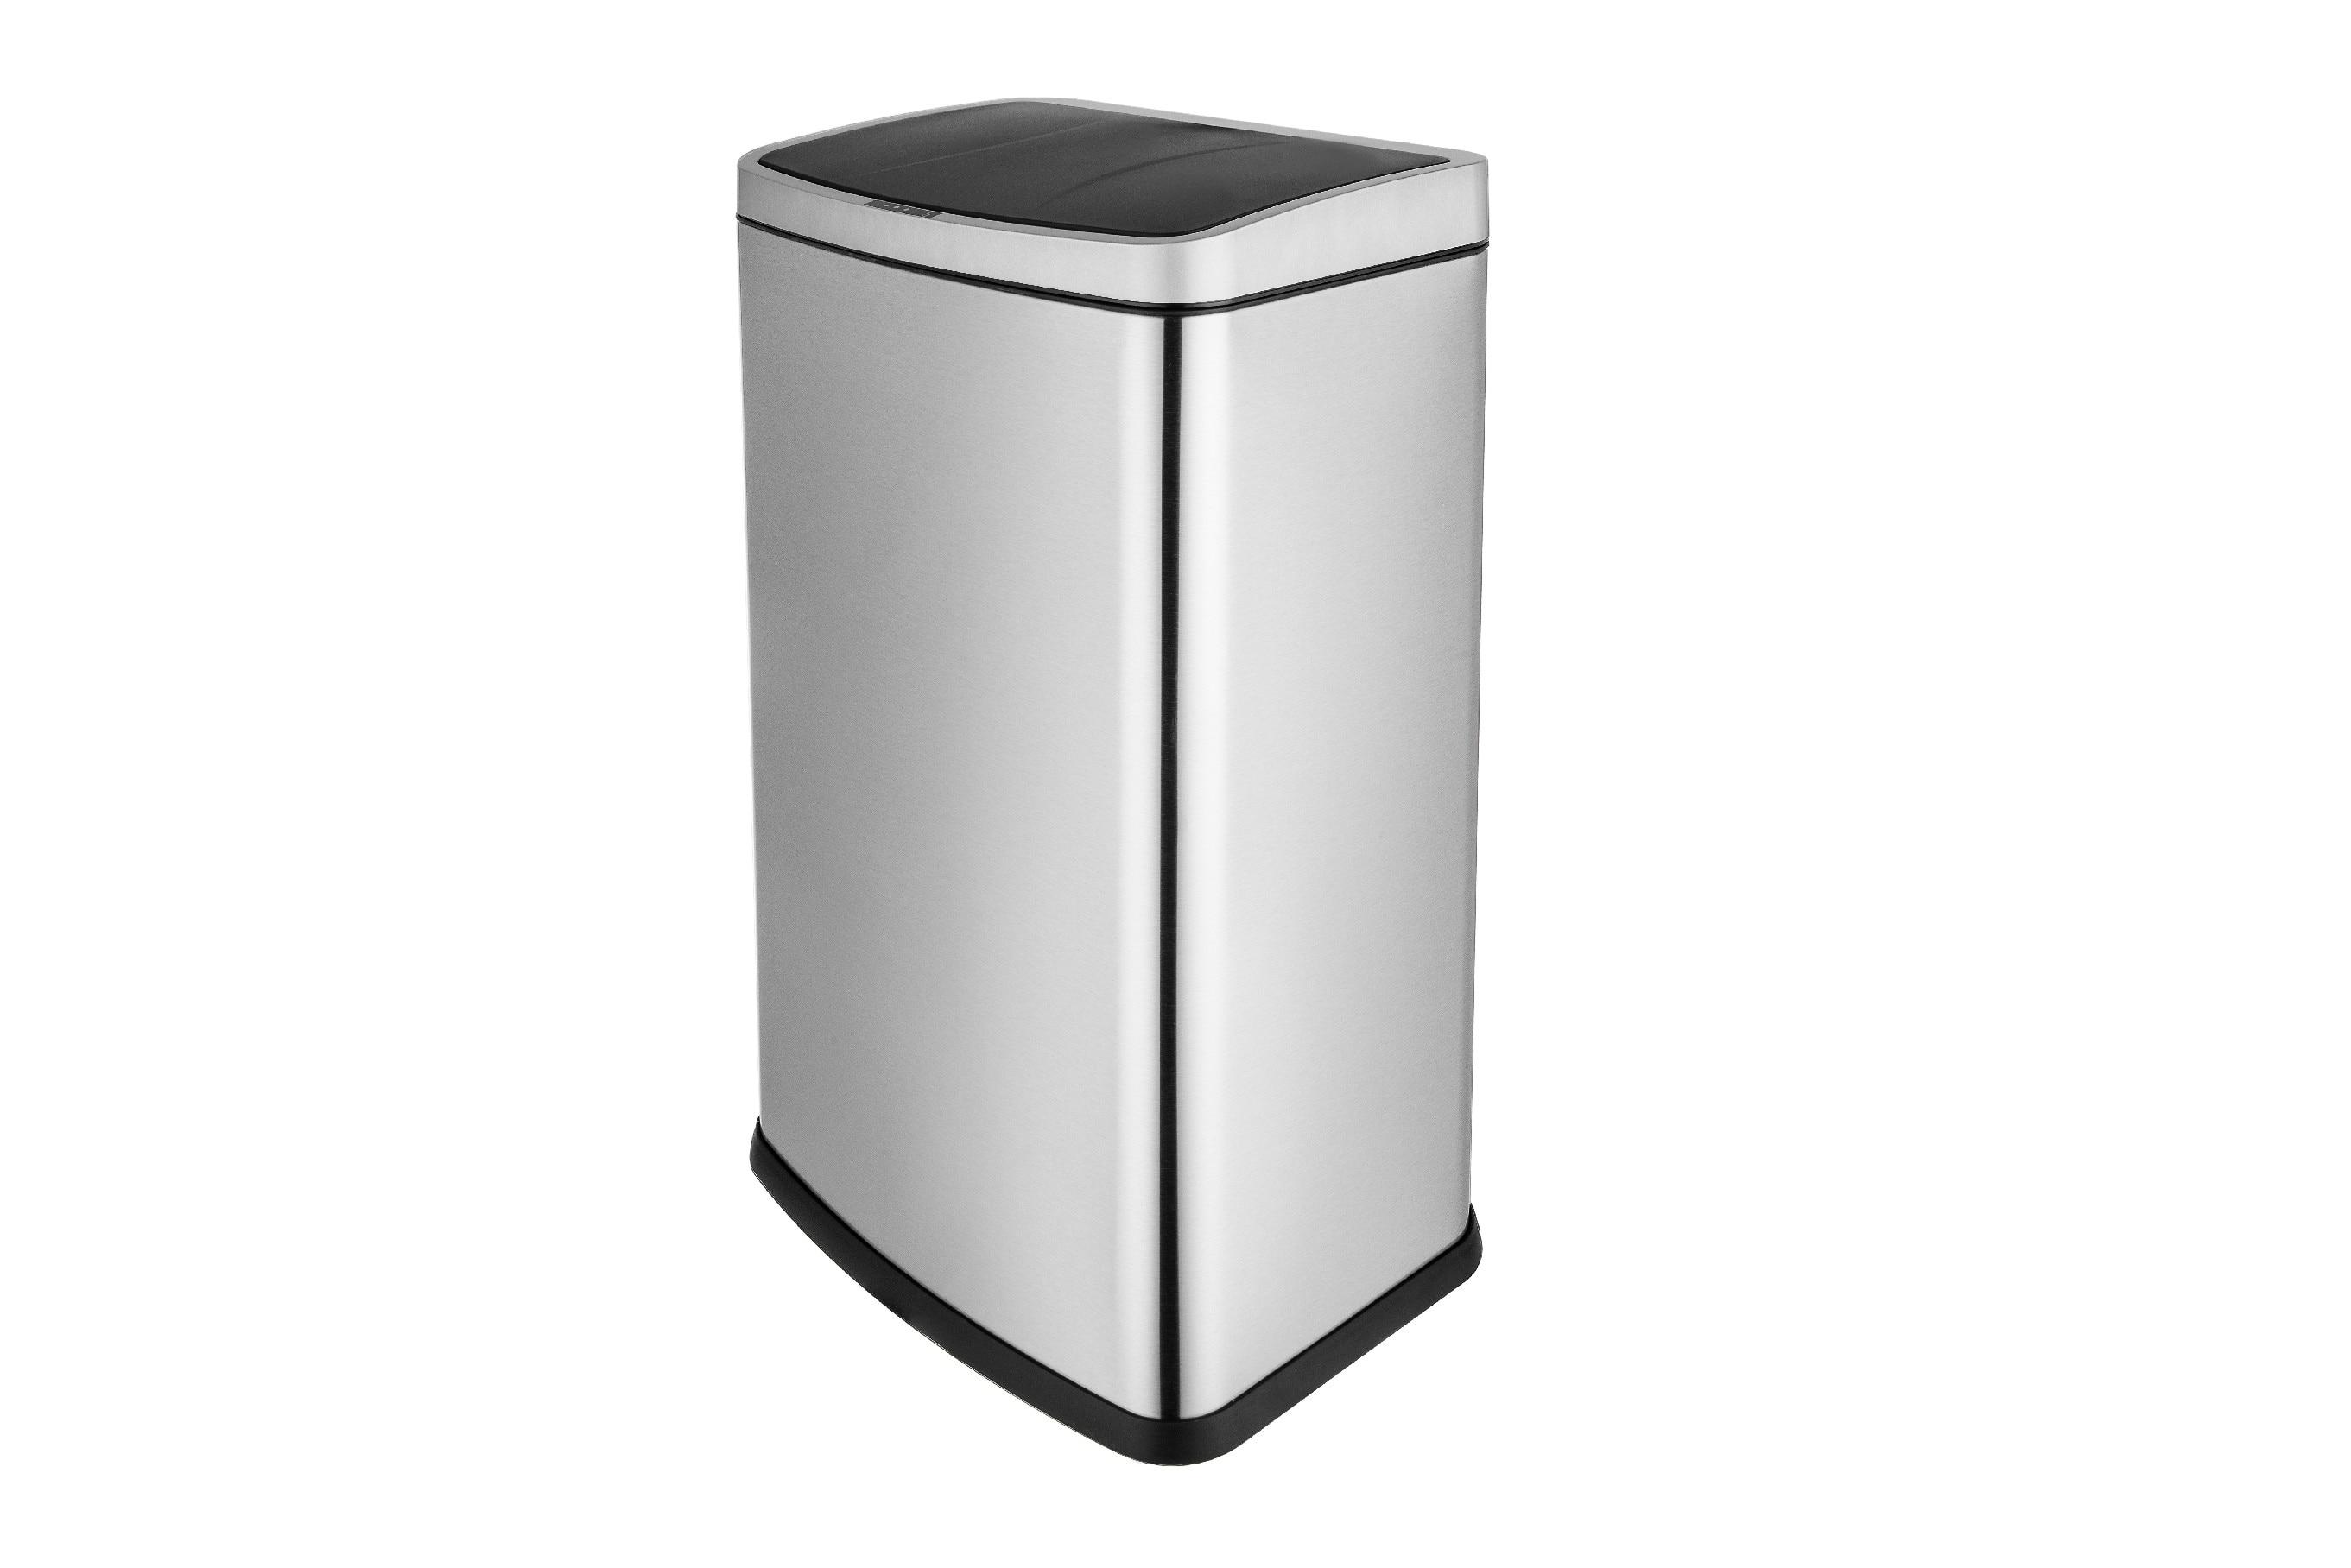 Smart Sensor Trash Can Touchness Household Dustbin Stainless Steel With Anti Finger Print Waste Bins Wide Open Kitchen Trash Bin|Waste Bins| |  - title=